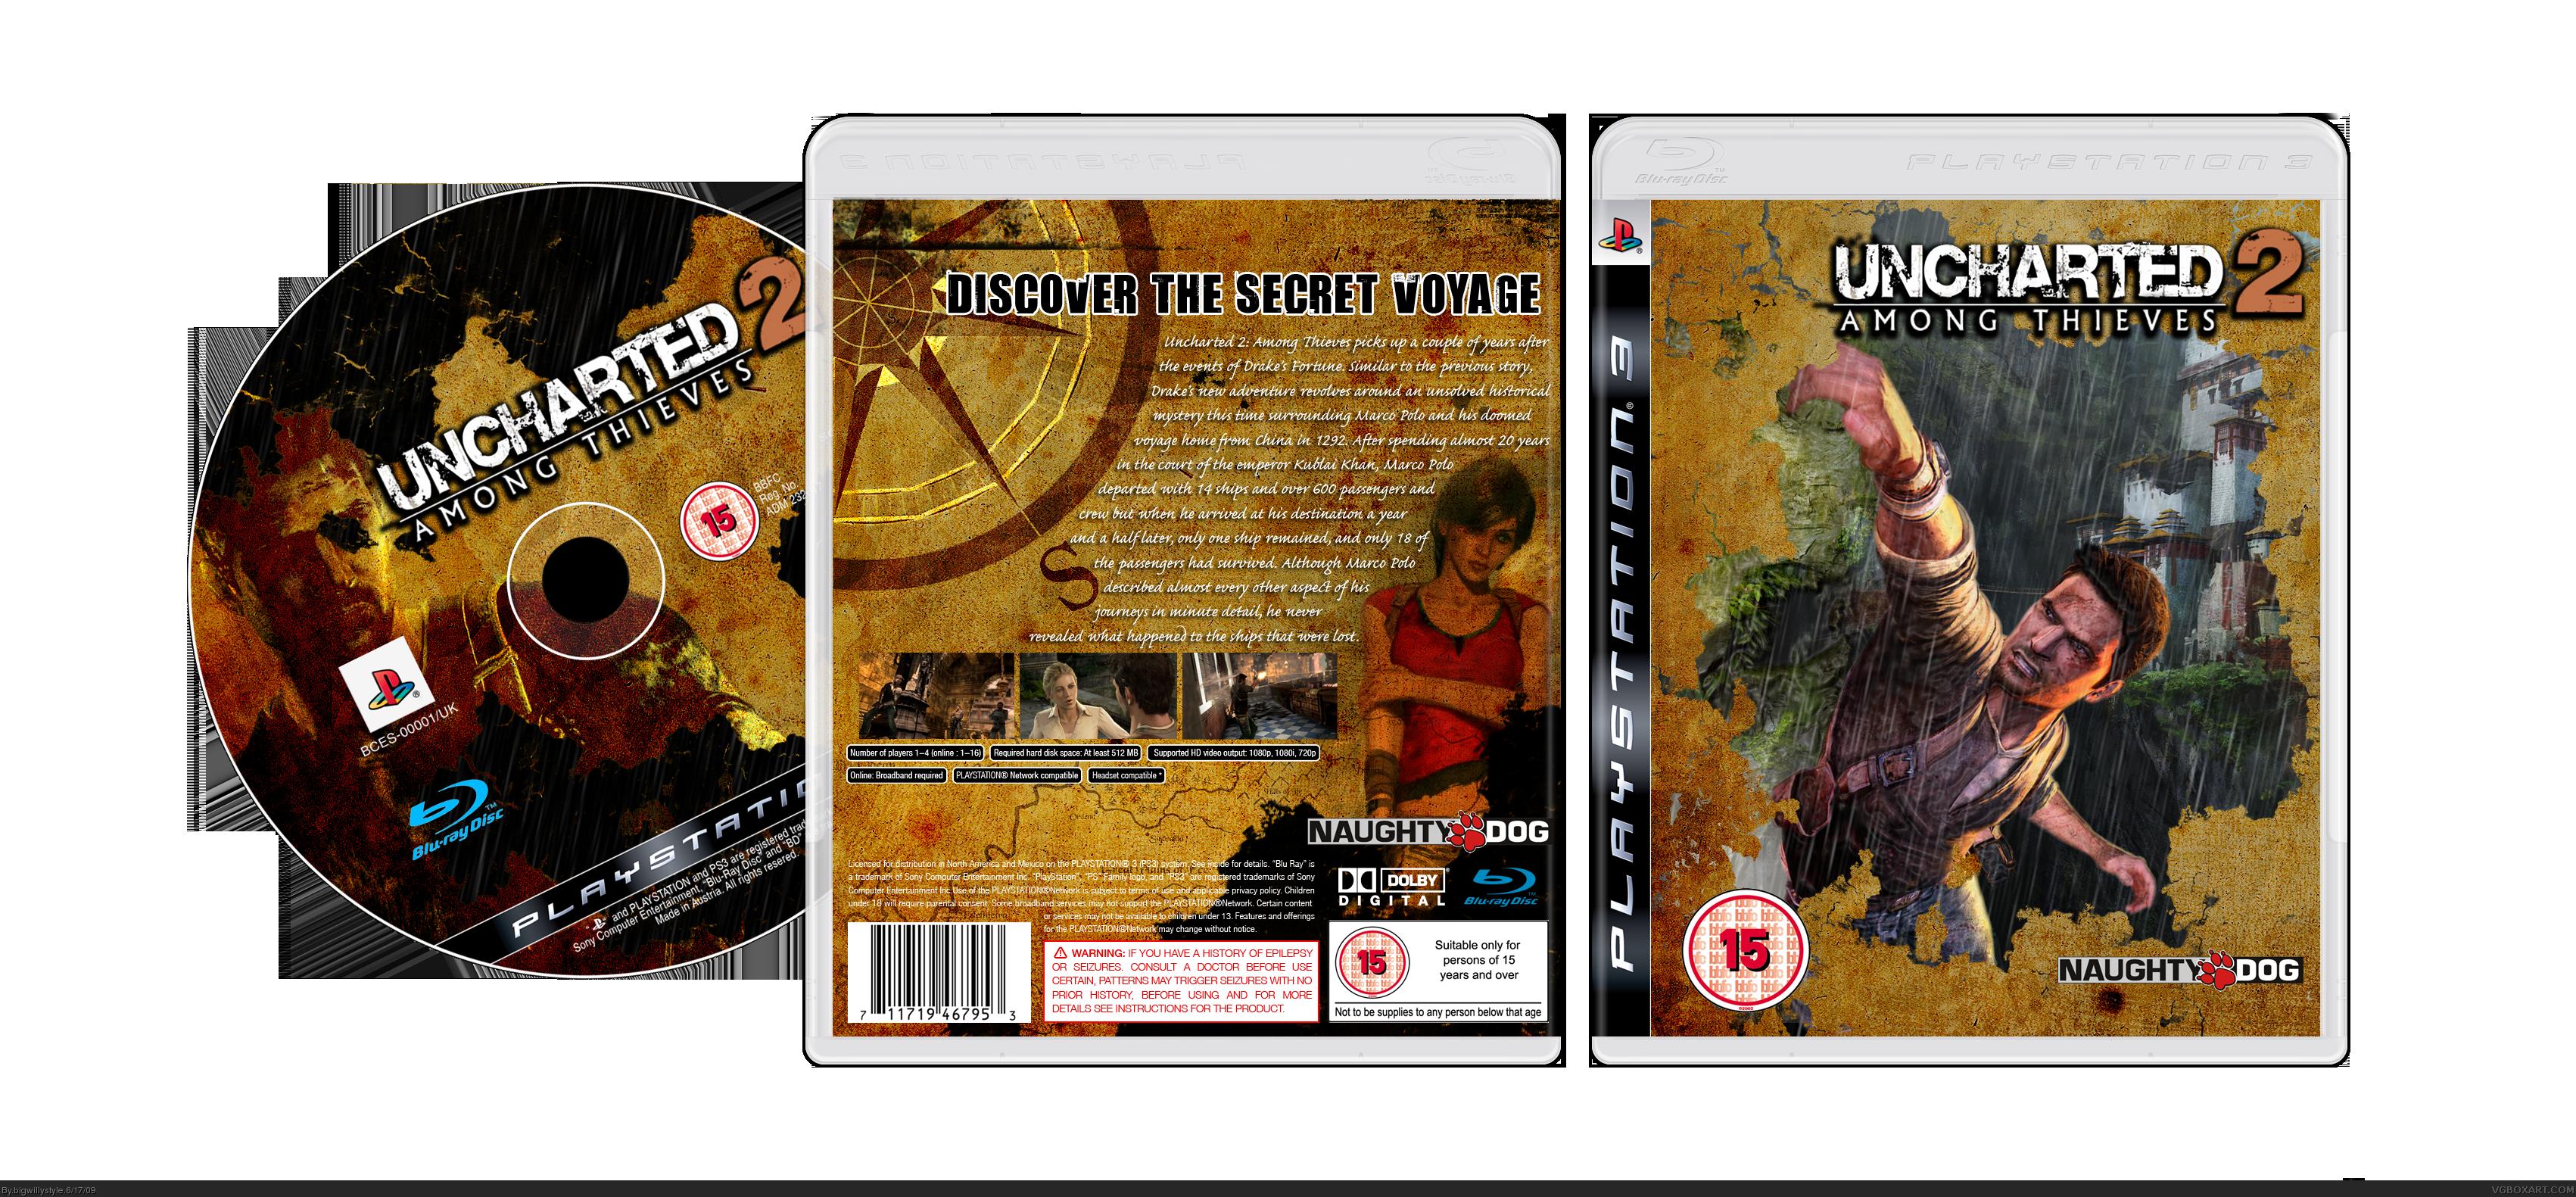 Uncharted 2: Among Thieves PlayStation 3 Box Art Cover by ...Uncharted 2 Among Thieves Cover